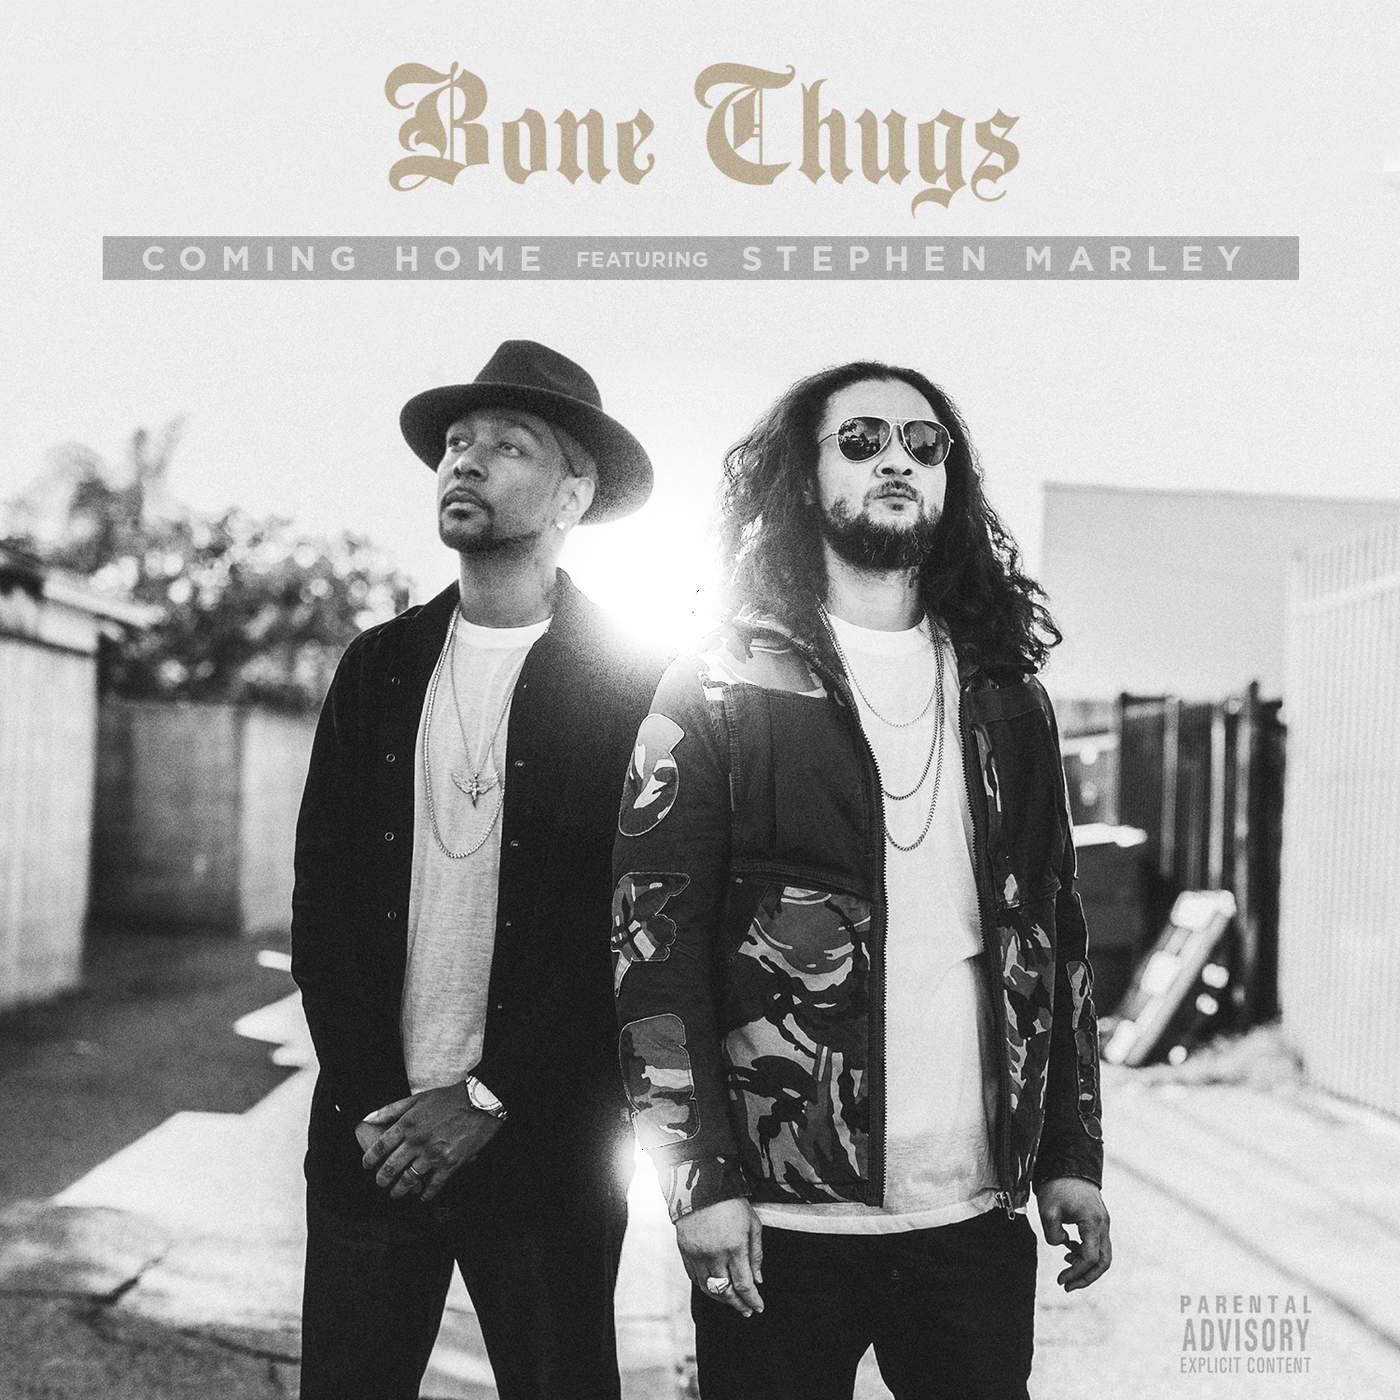 Bone Thugs-n-Harmony - Coming Home (feat. Stephen Marley) - Single Cover